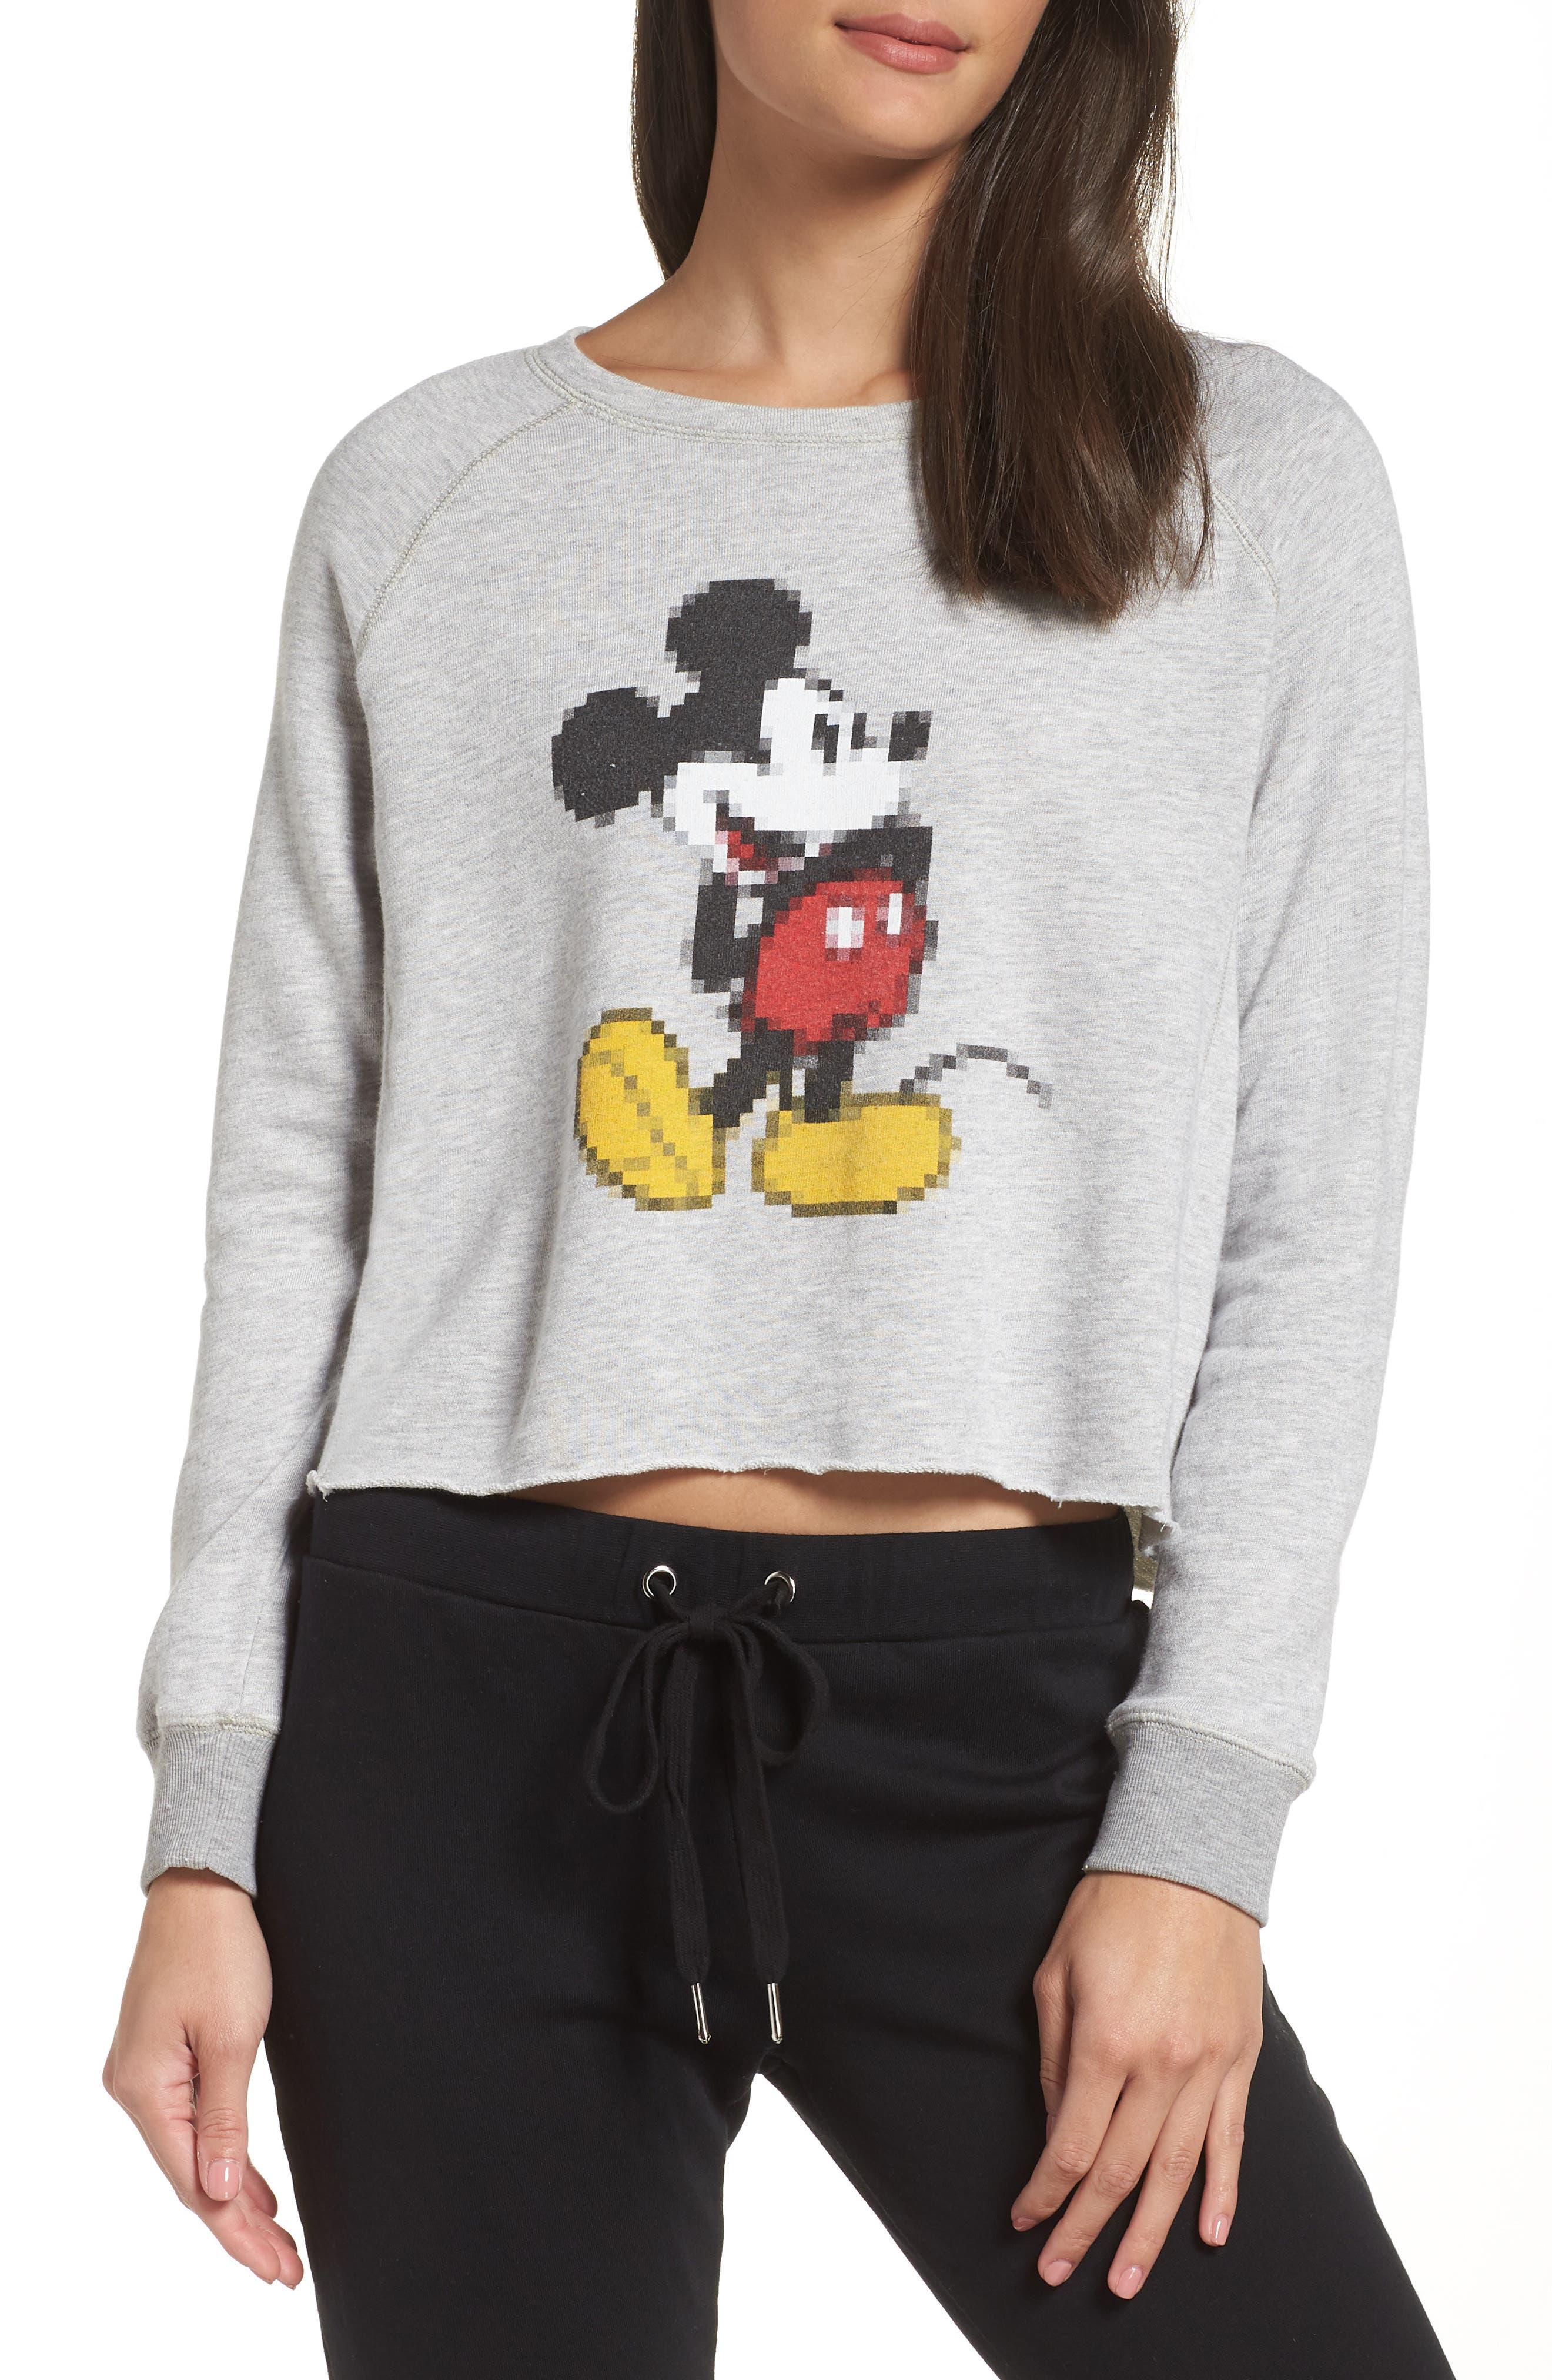 DAVID LERNER Disney Mickey Pixel Sweatshirt in Heather Grey/ Hea